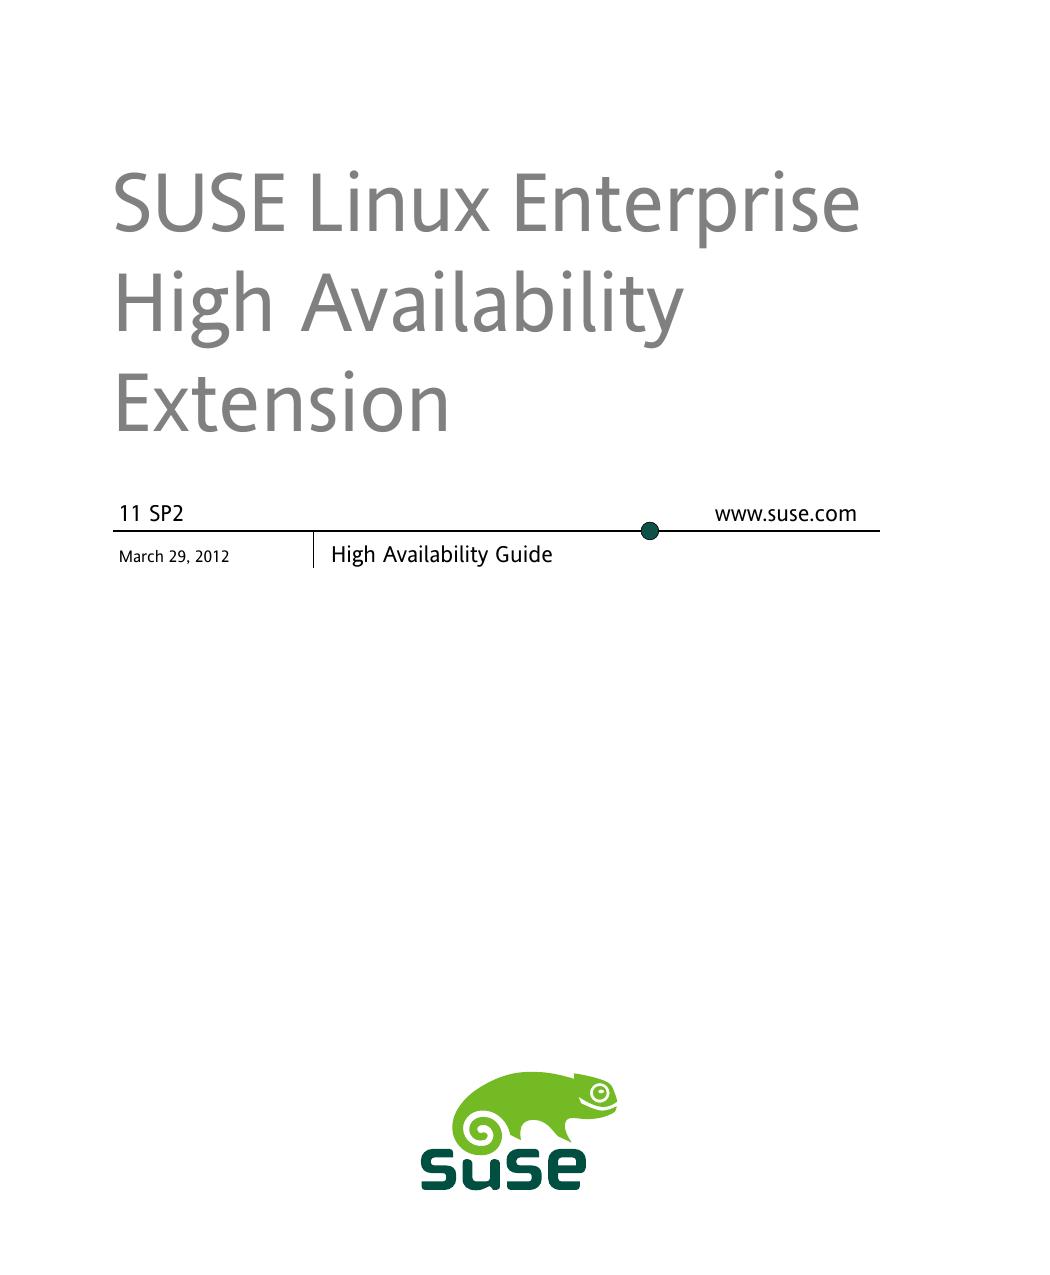 SUSE Linux Enterprise High Availability Extension Documentation